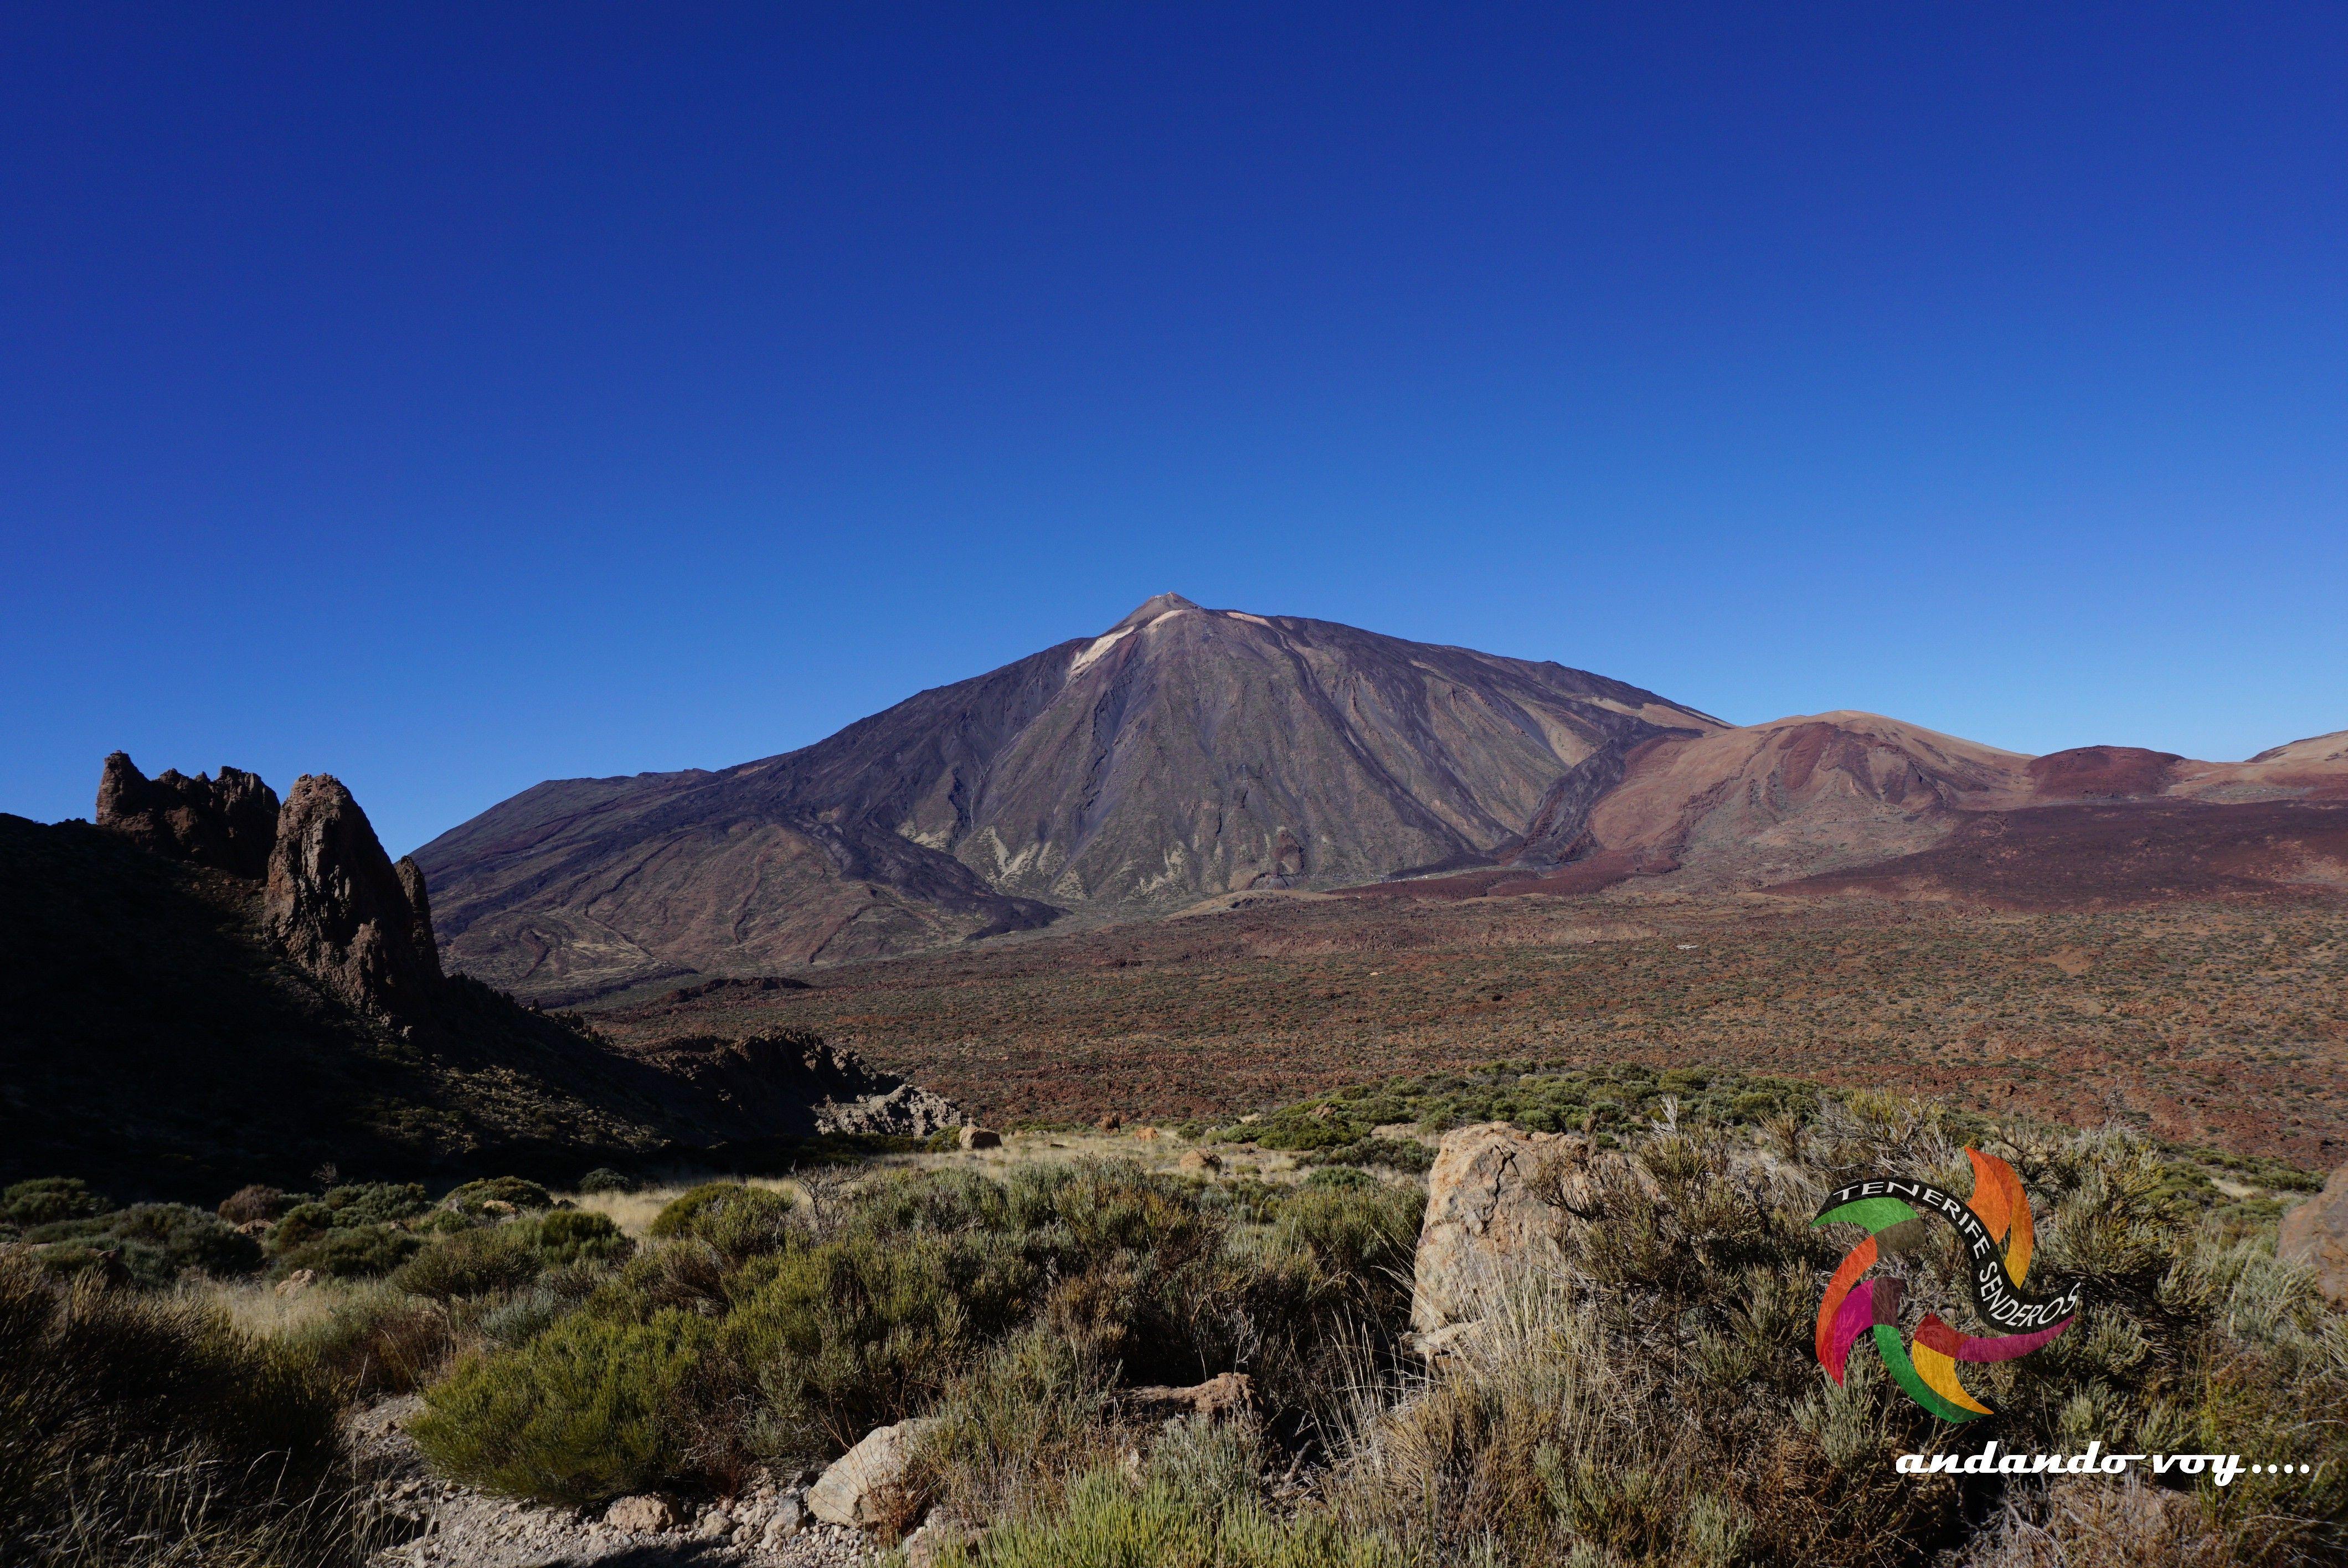 En la ruta el Filo  #senderismo  #hiking #hike #outdoors #landscape  #trekking #teide #tenerifesenderos